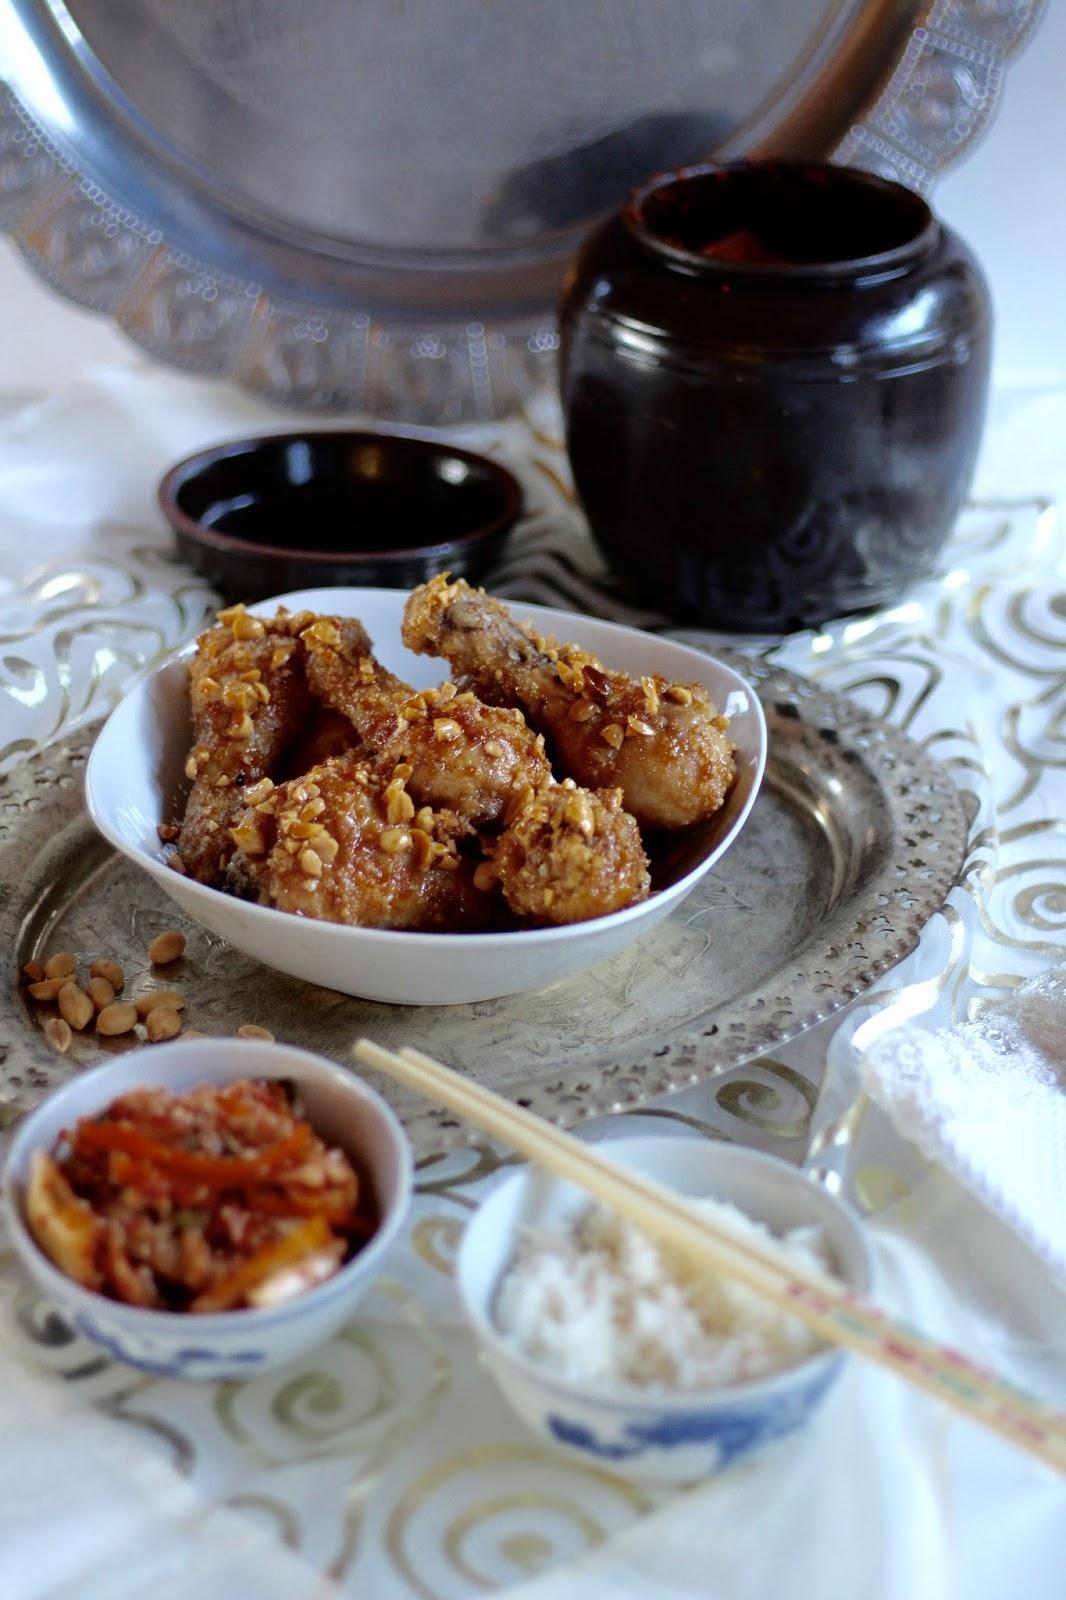 Crispy Corean Chicken - Rezept folgt!